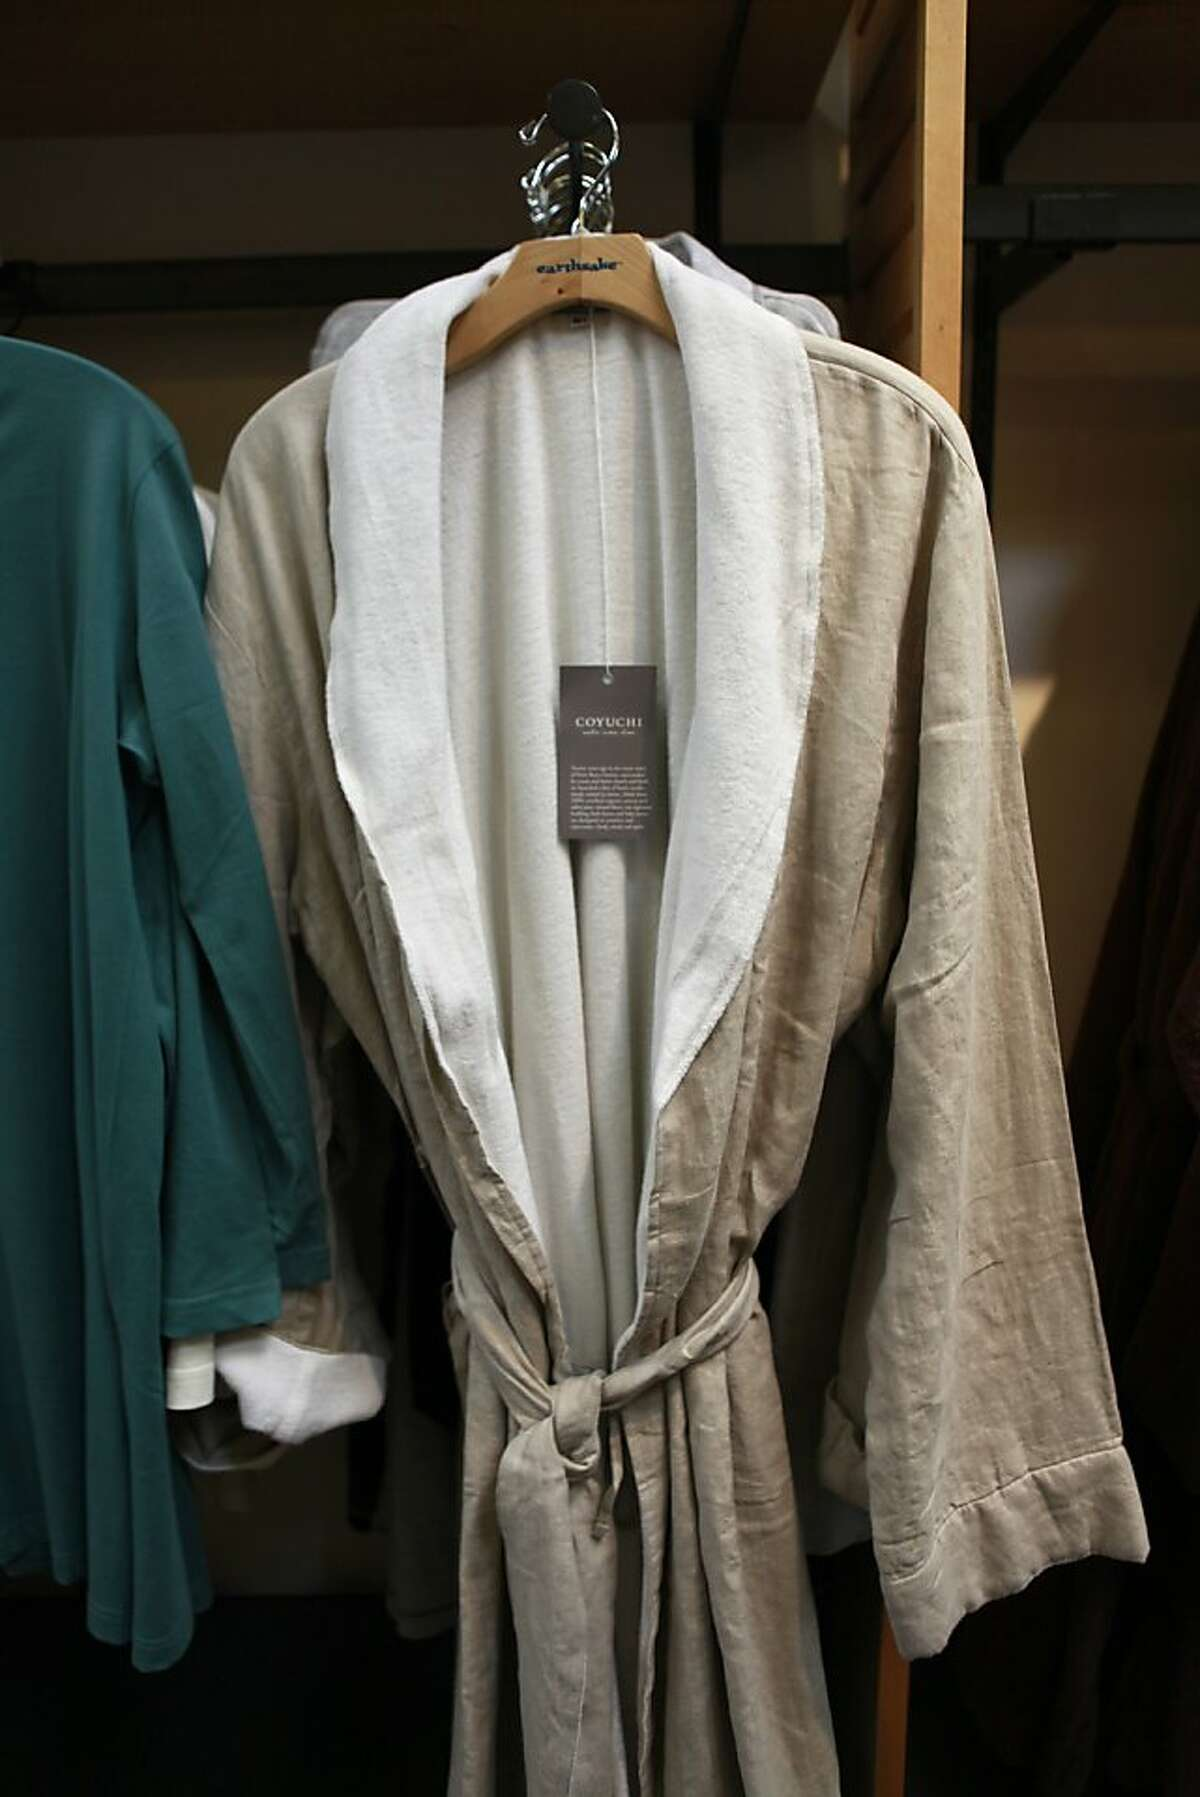 Coyuchi linen terry robe sold at Earthsake store, in Berkeley, California on Wednesday, April 11, 2012.